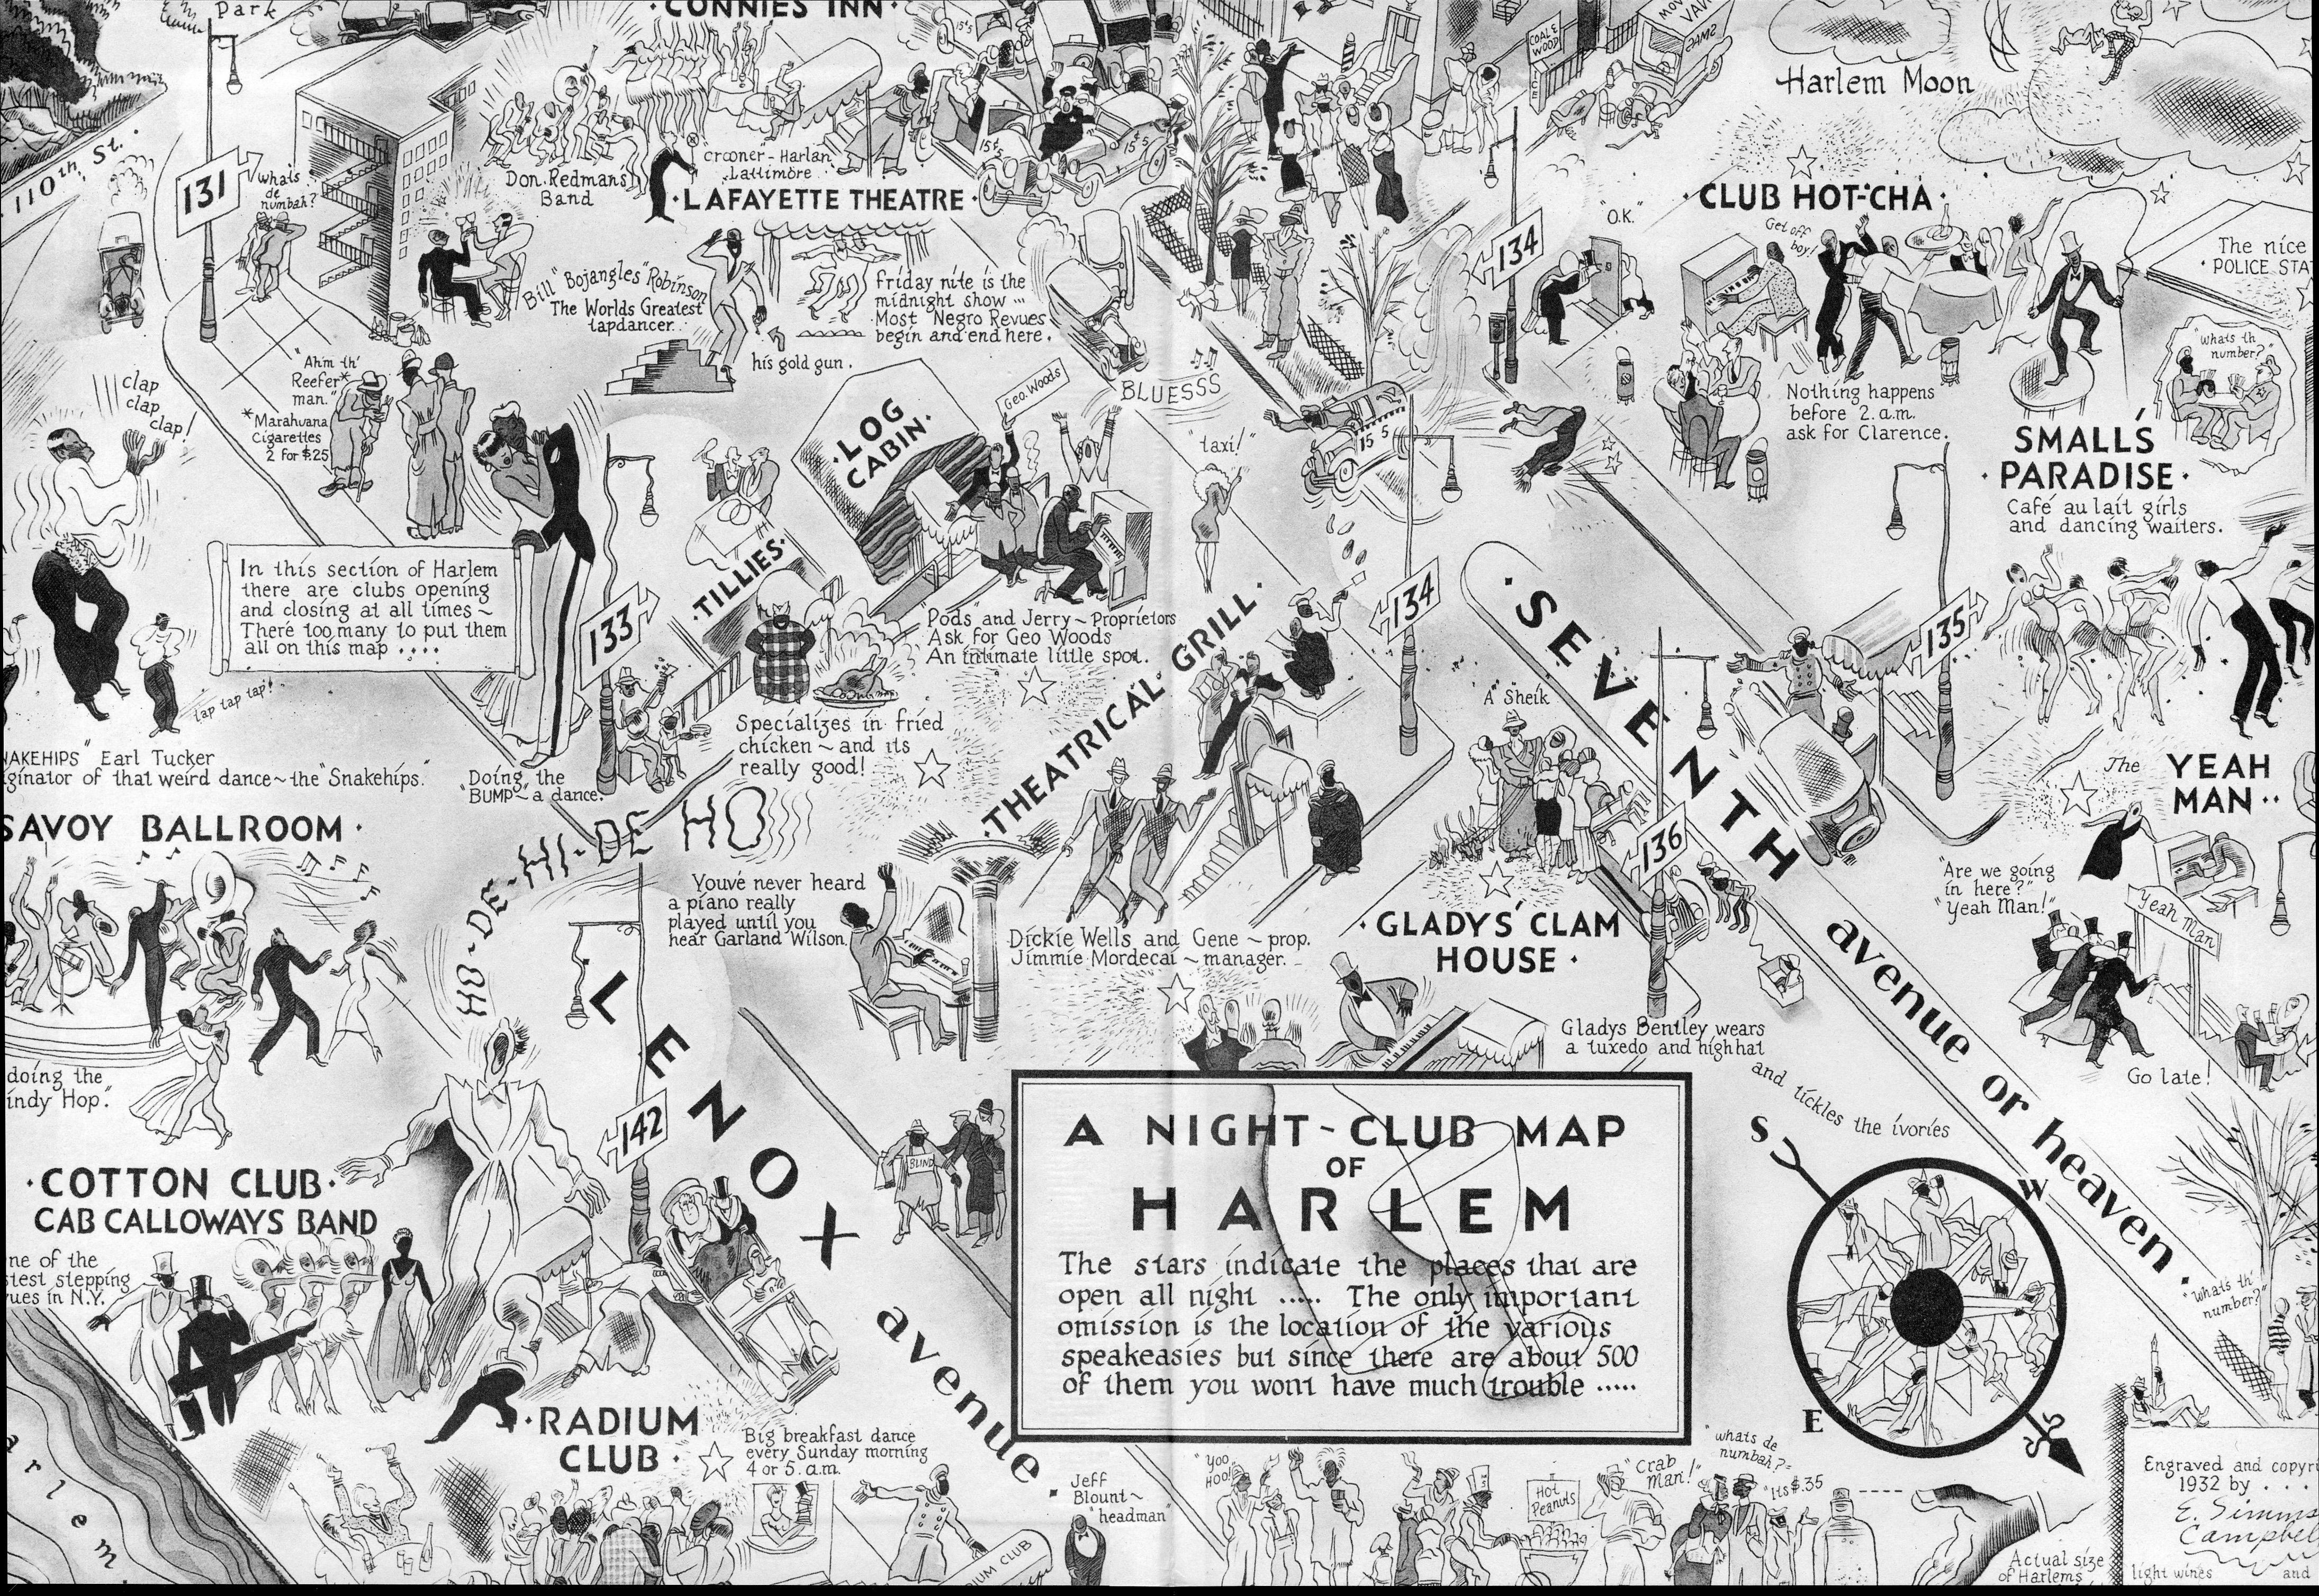 nightclub_map_of_harlem_090115